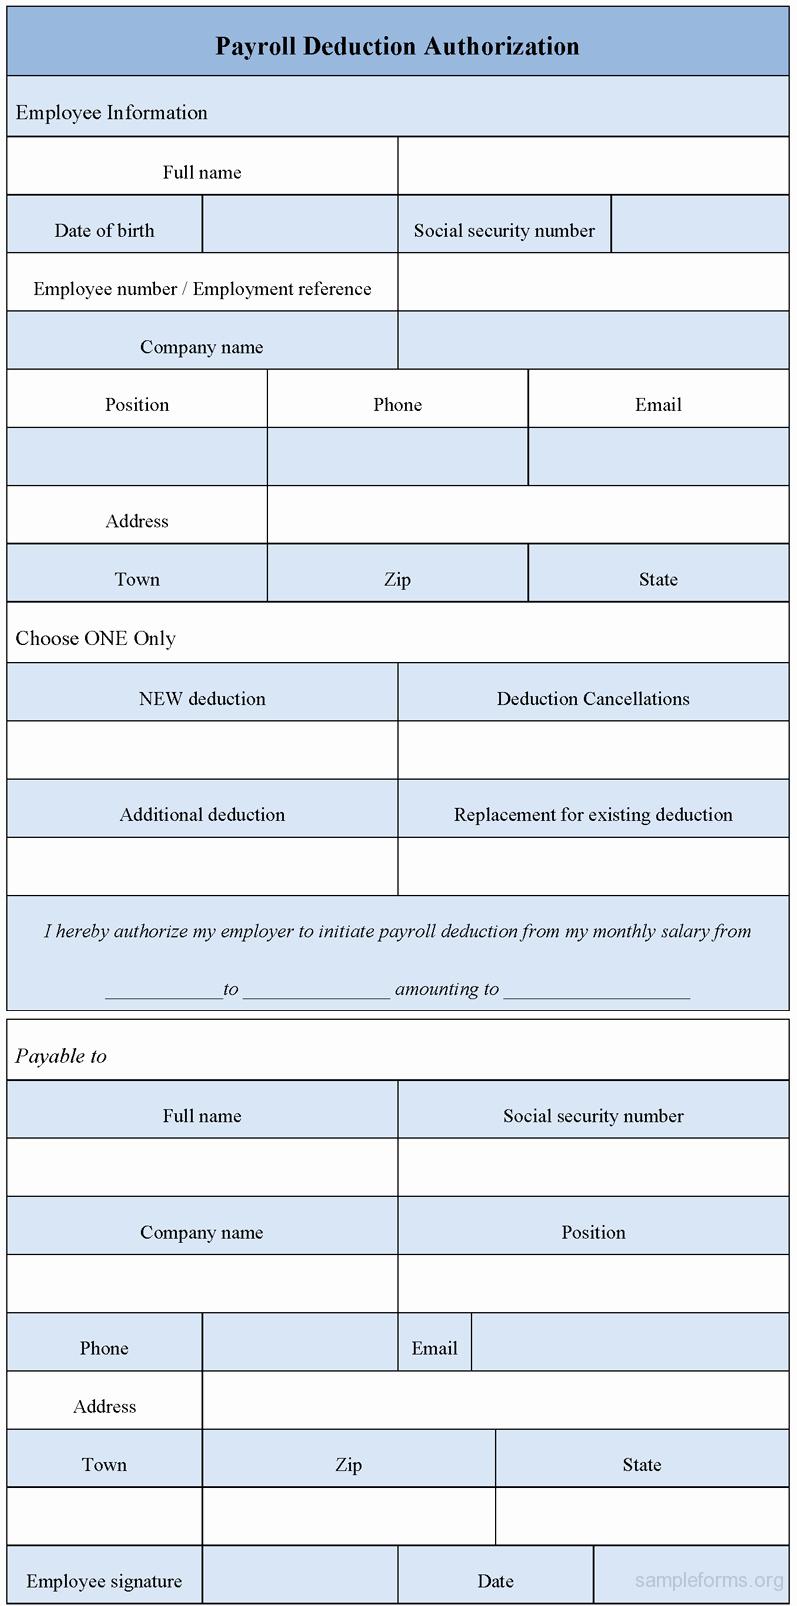 Payroll Deduction Authorization form Luxury Payroll Deduction Authorization form Sample forms